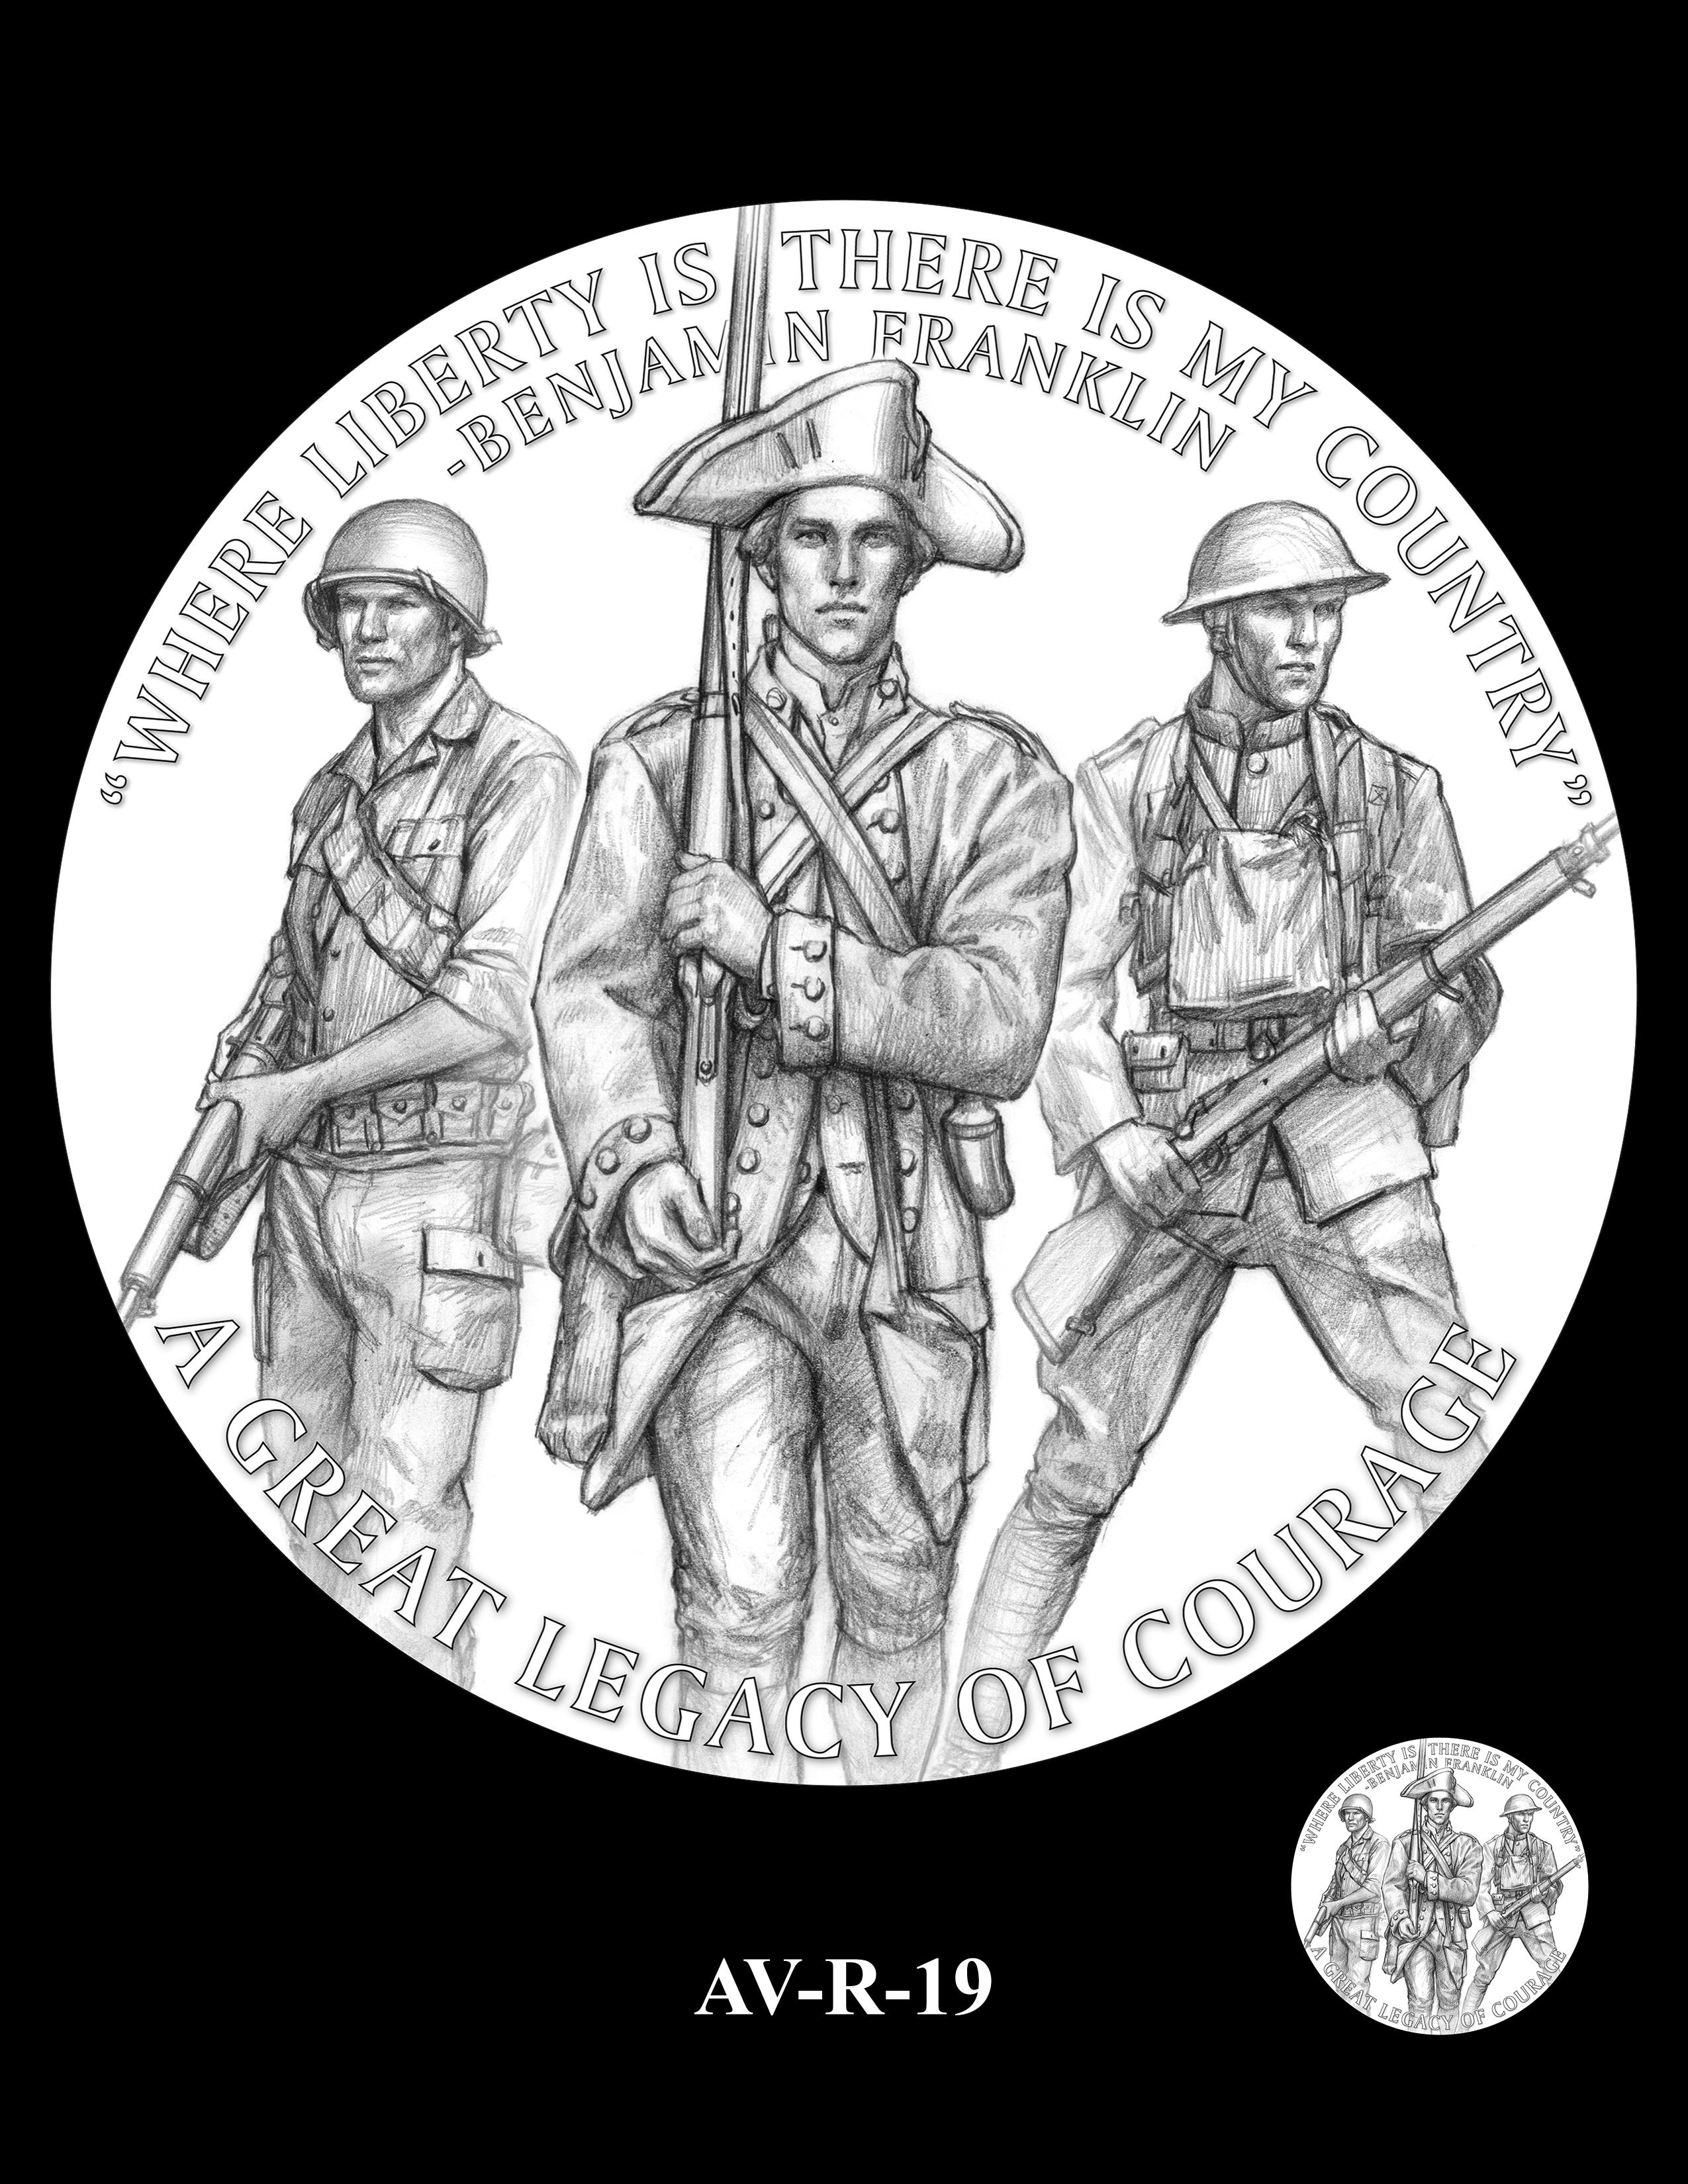 AV-R-19 - American Veterans Medal